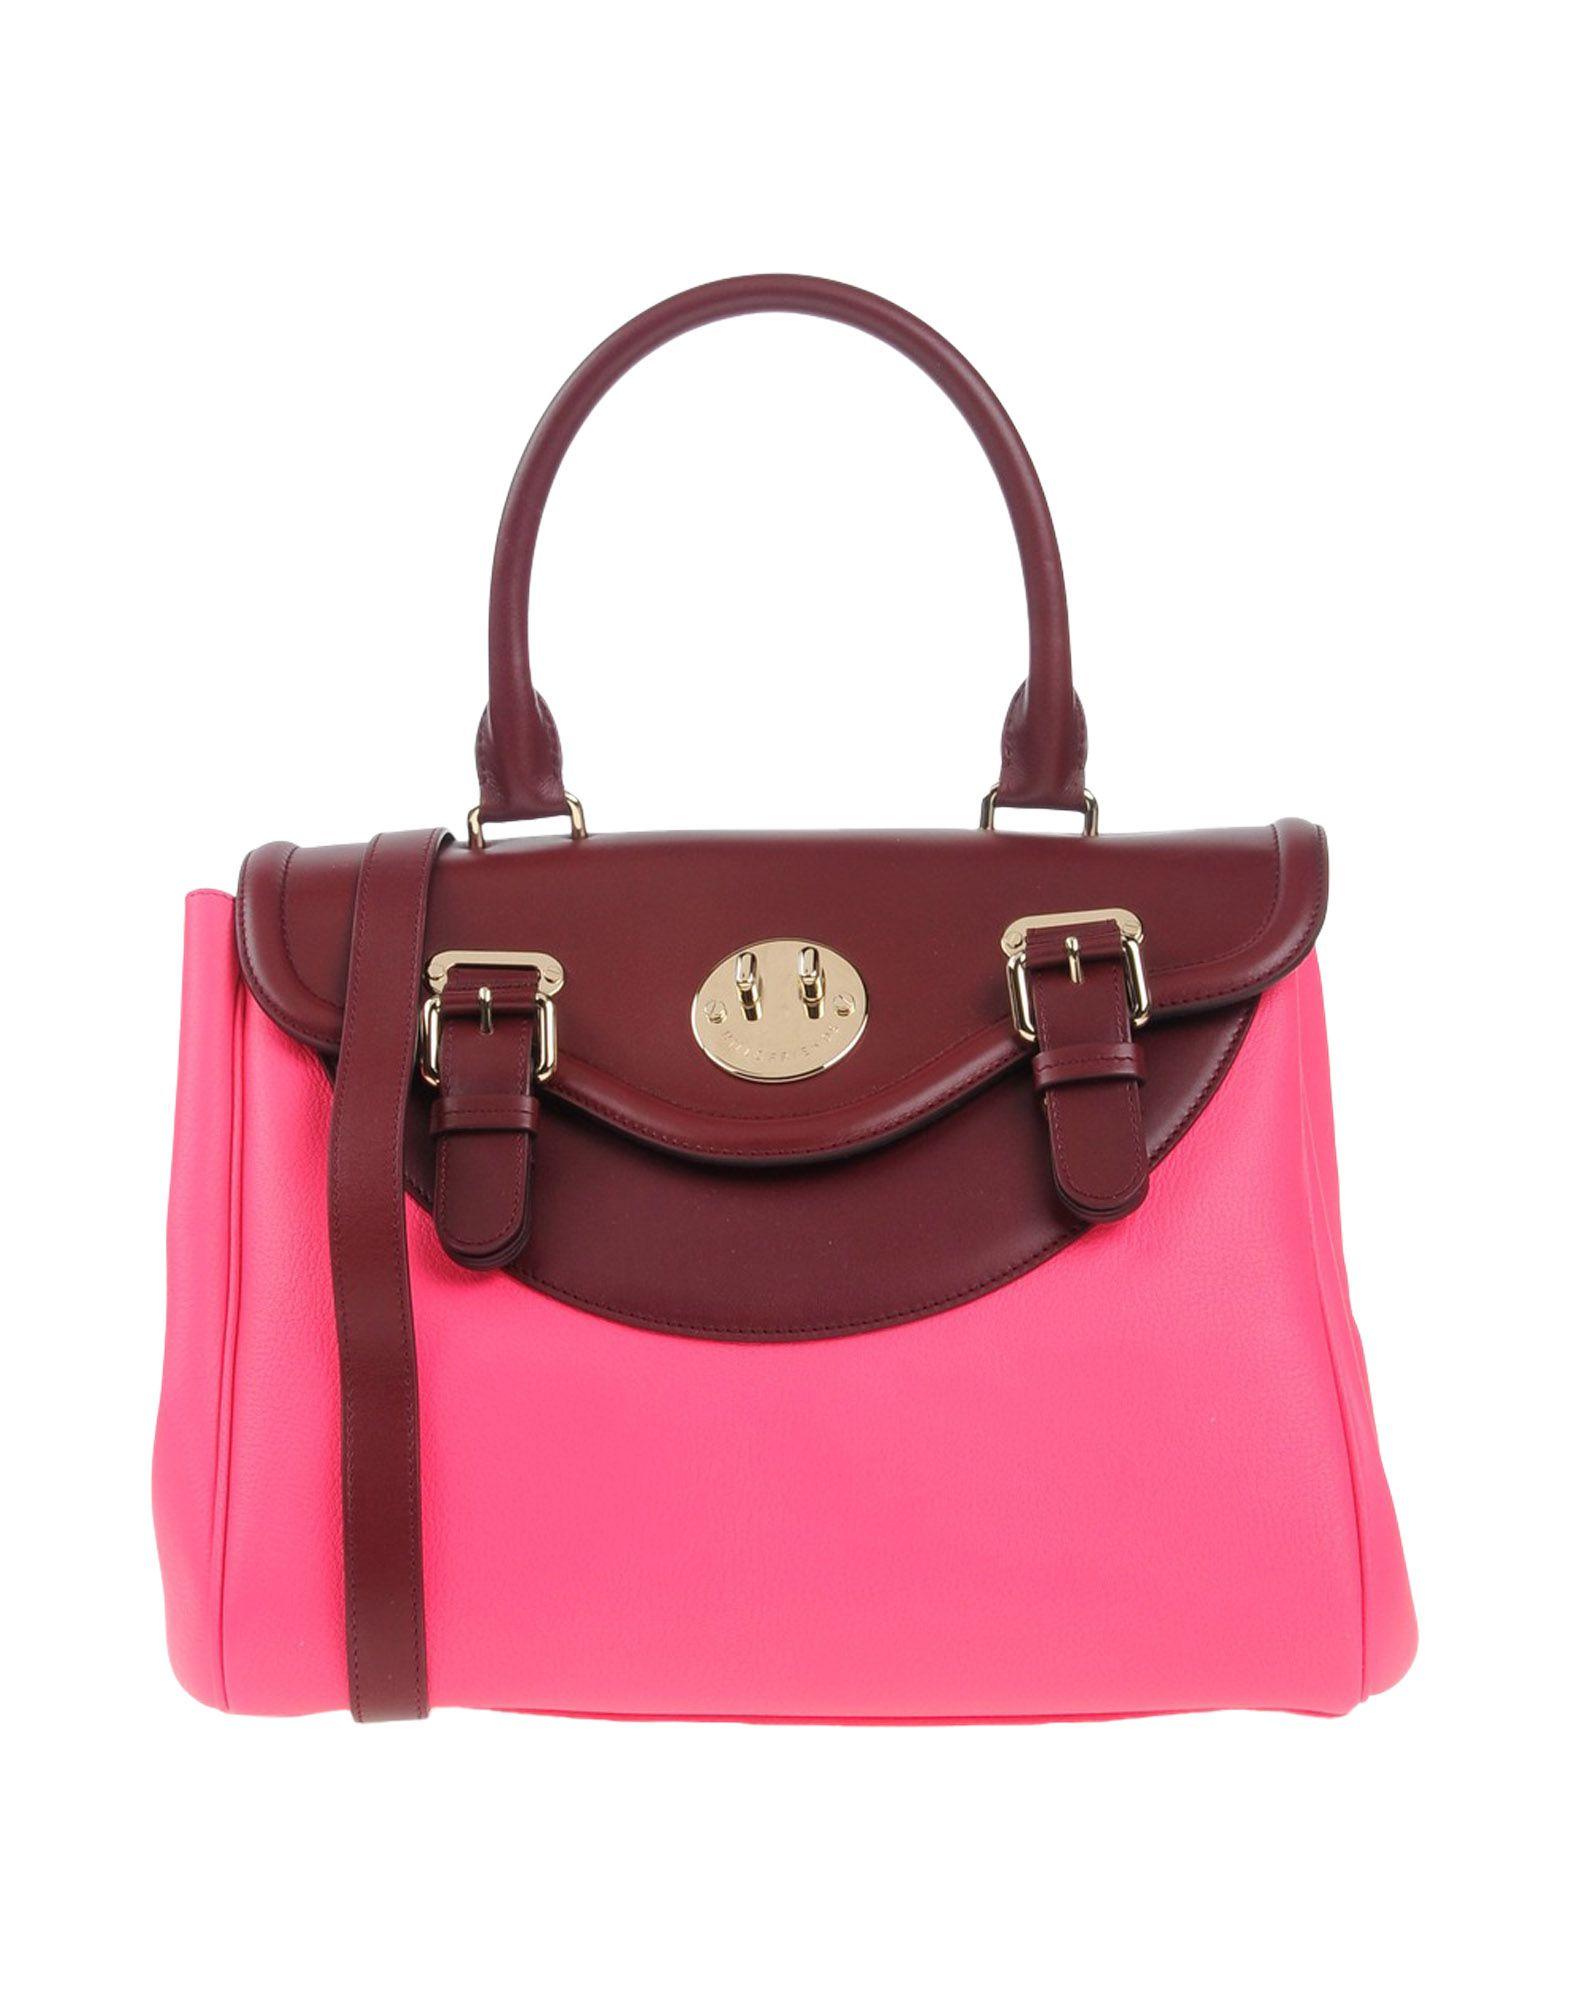 HILL & FRIENDS Handbag in Fuchsia